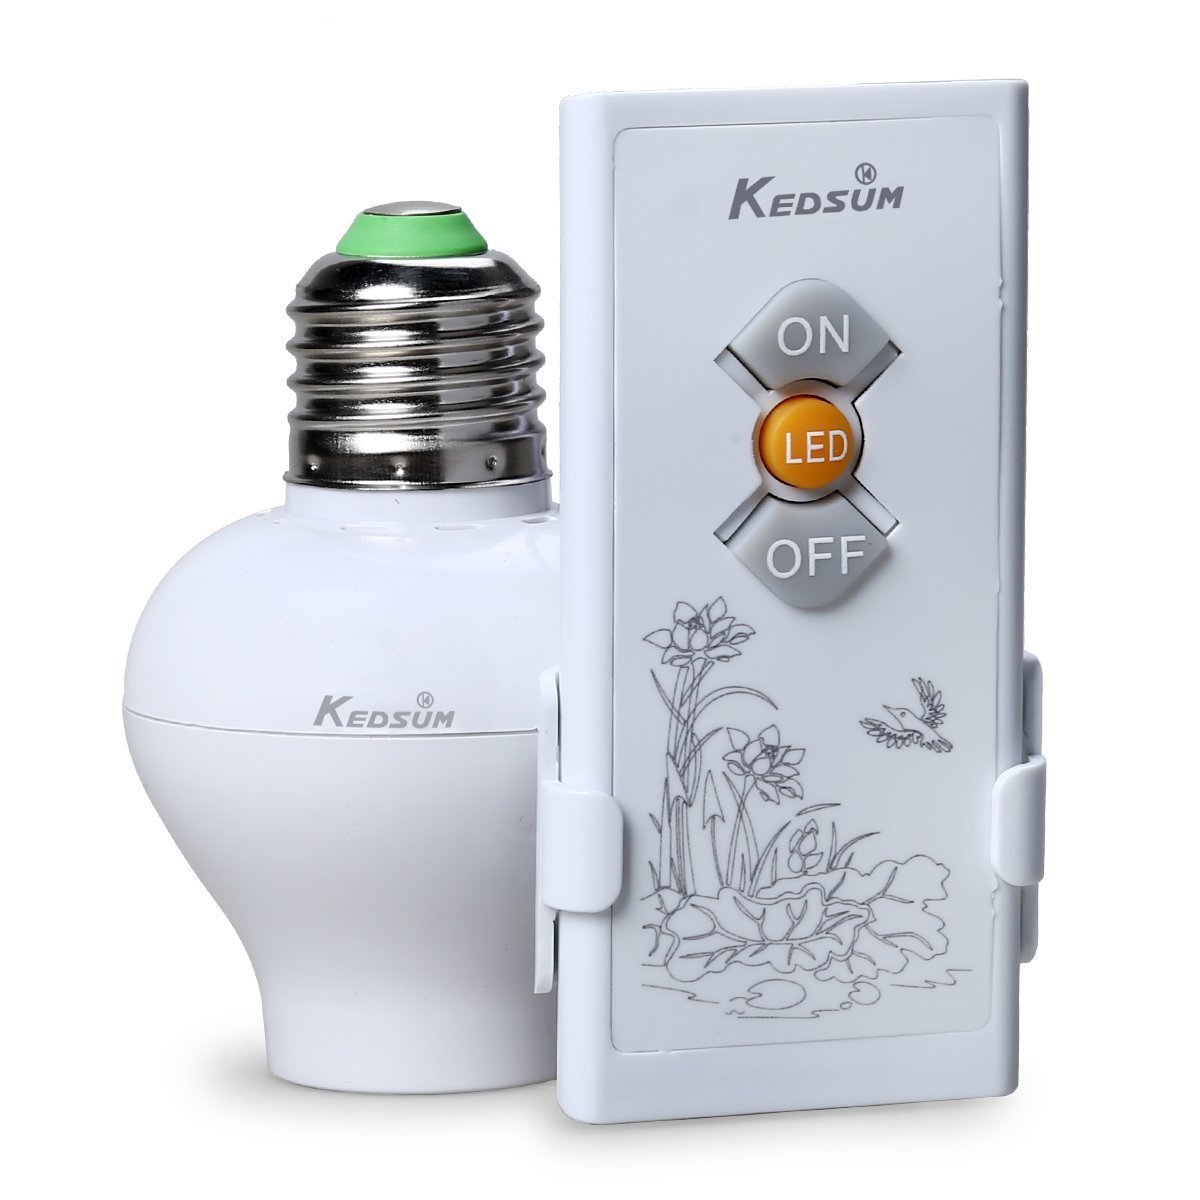 KEDSUM Wireless Remote Control E26/E27 Light Bulb Socket & ON/OFF Remote Controller Switch, Wireless Light Switch Kit, Remote Lighting Fixtures